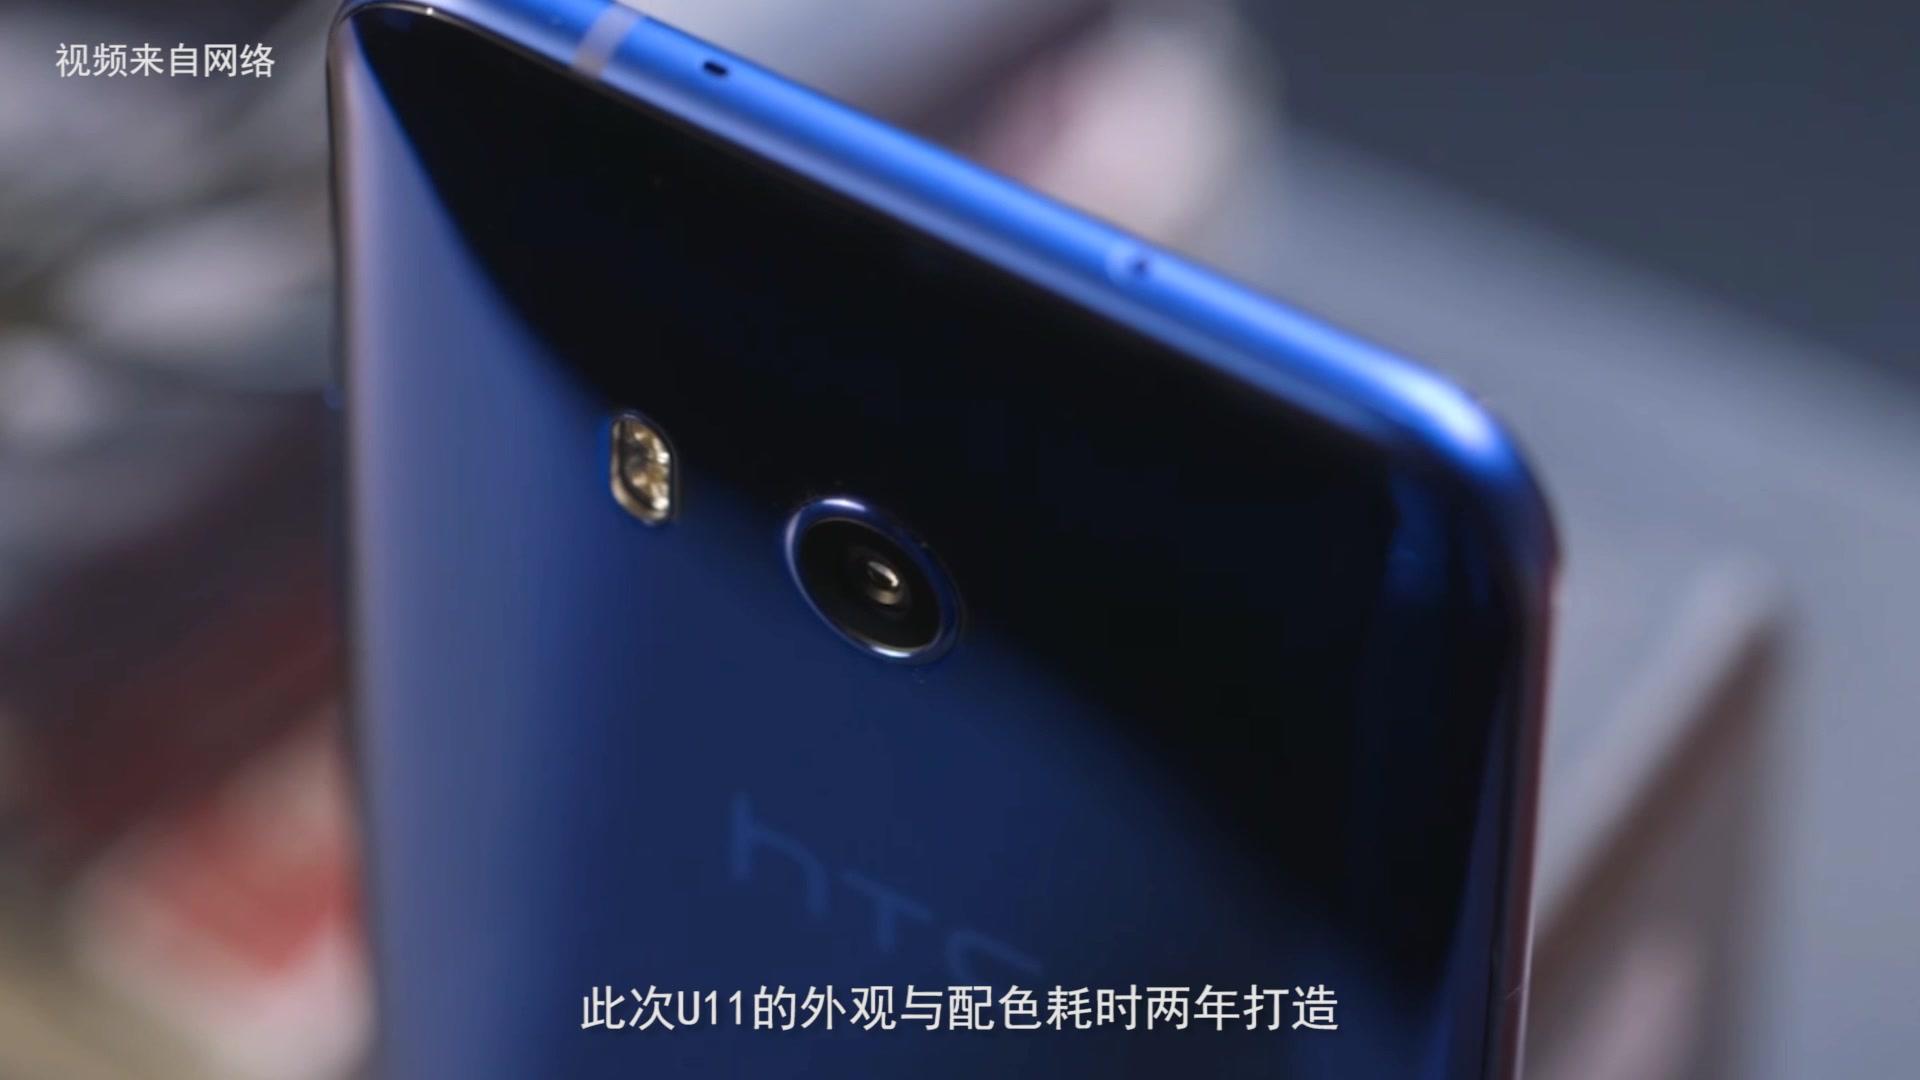 HTC U11两年打磨,重新定义手机交互体验